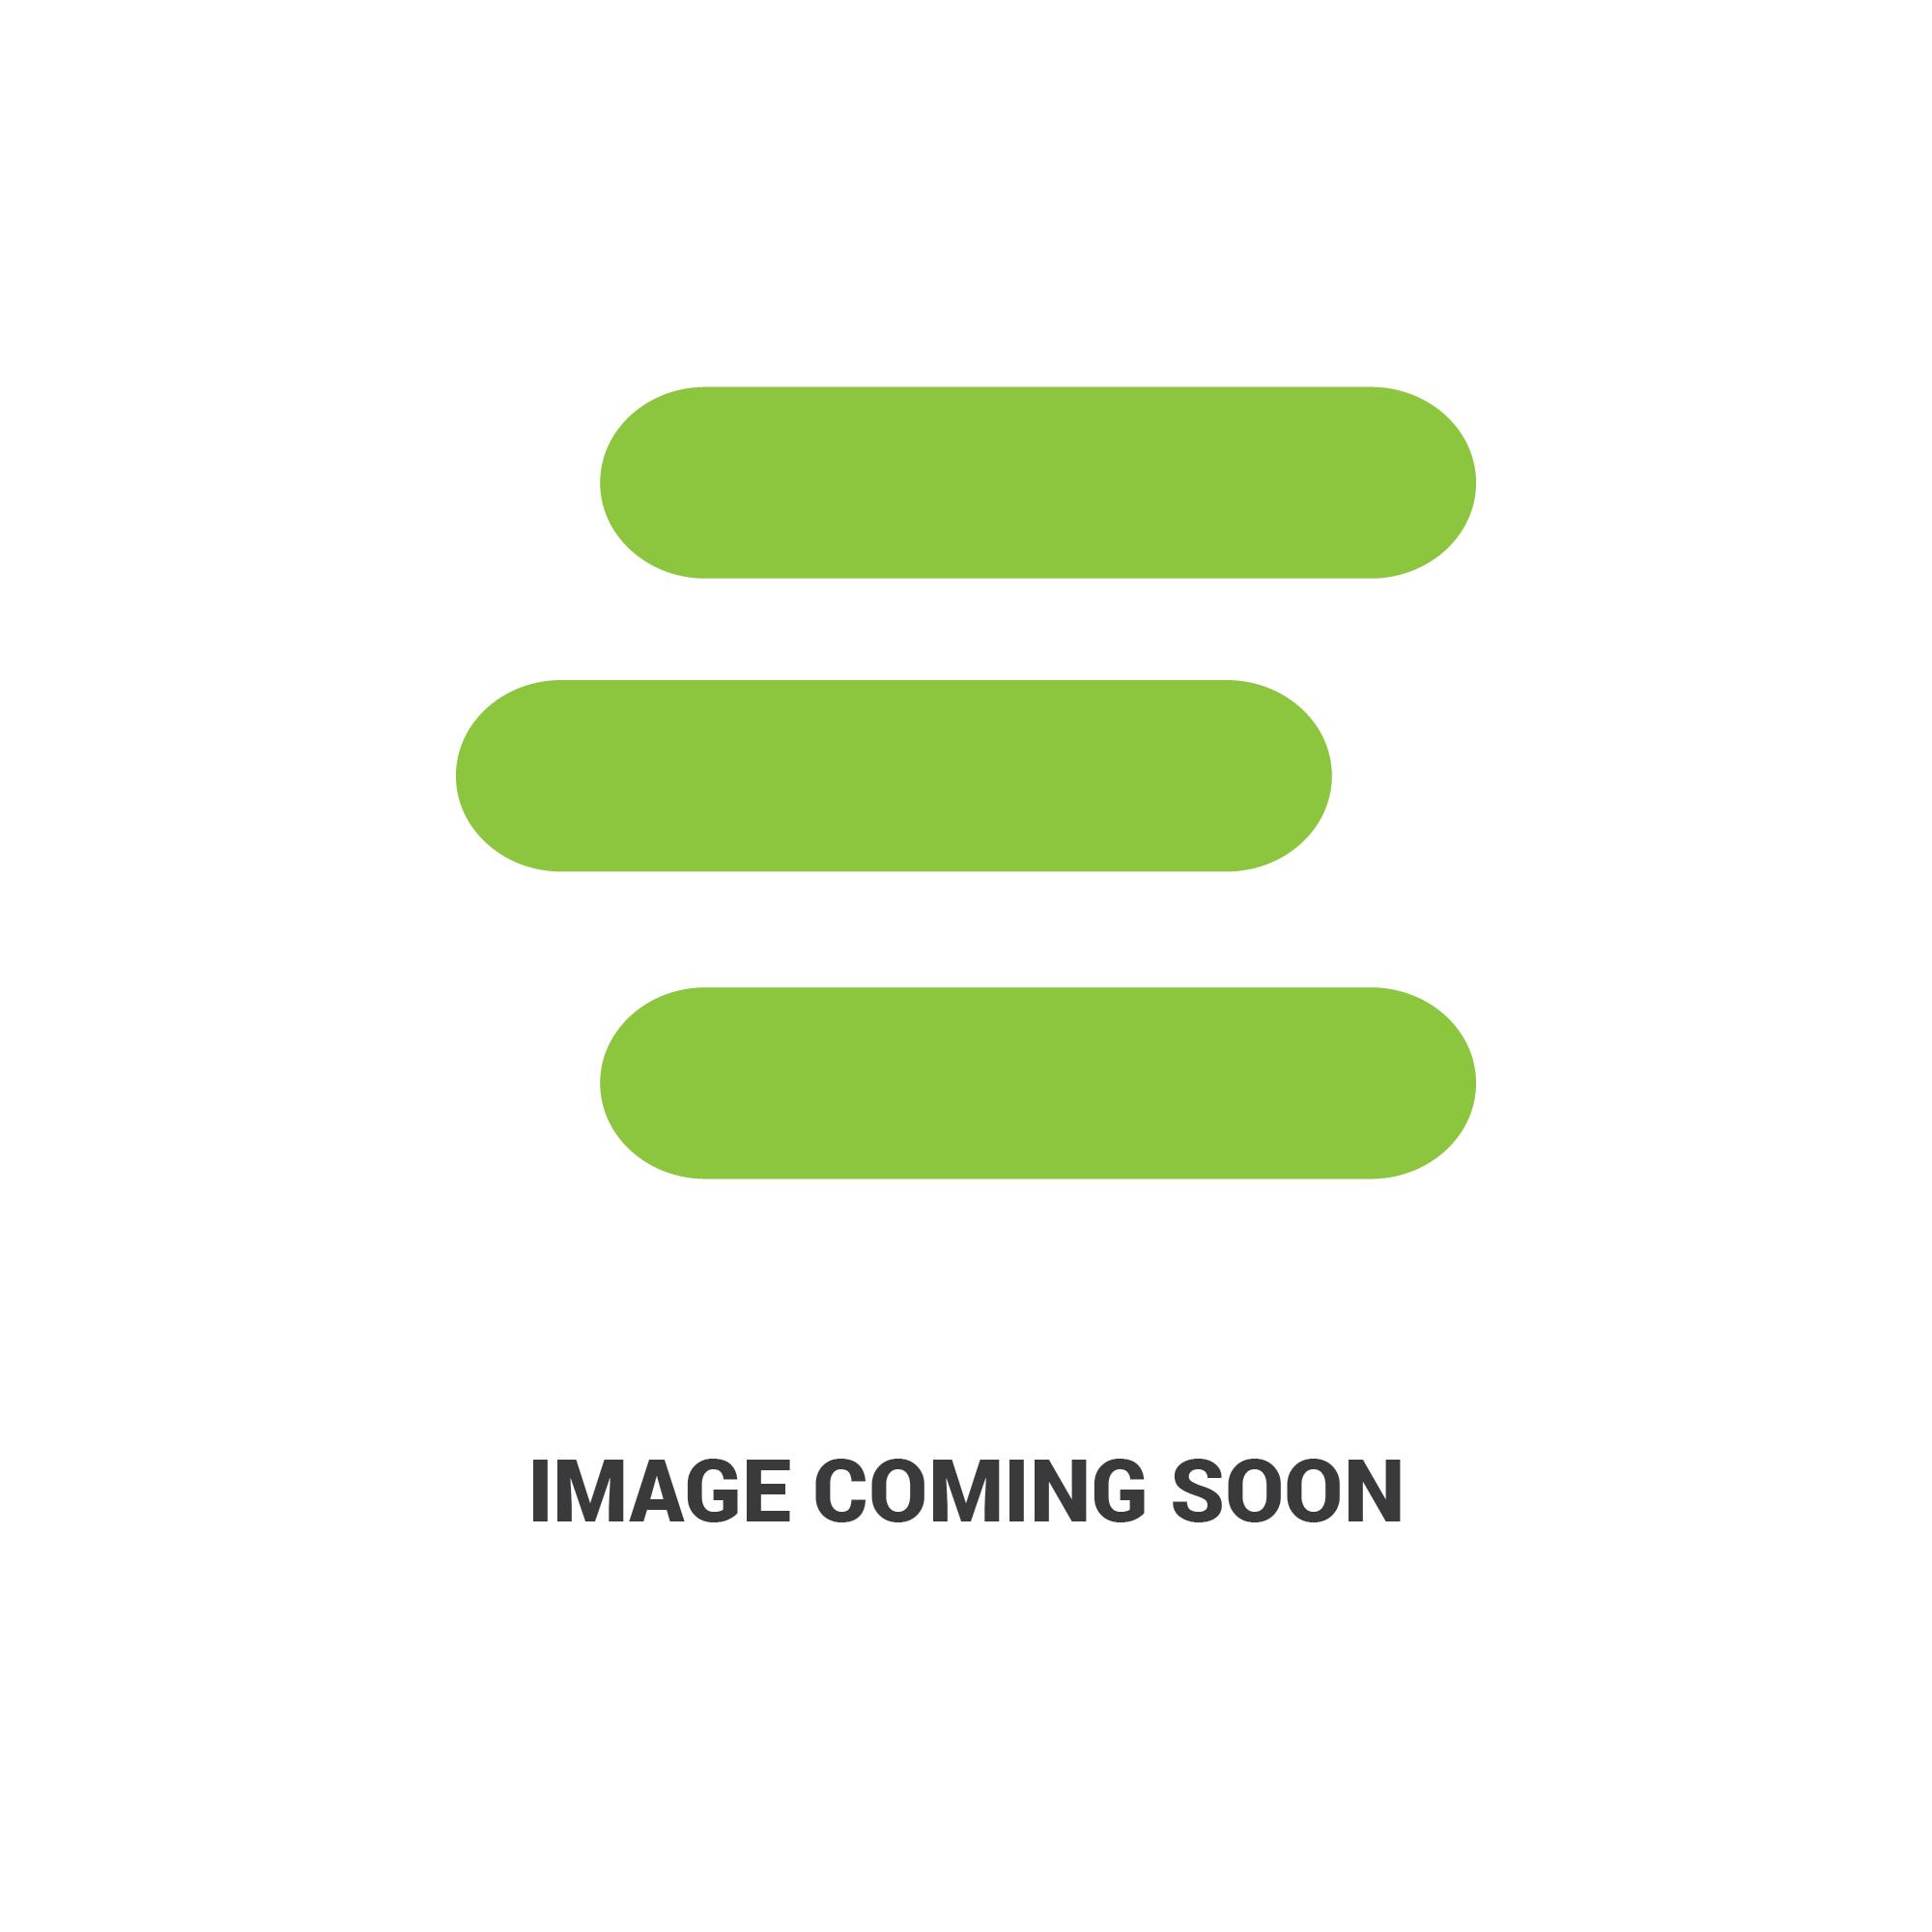 E-3J080-108702037_1.jpg